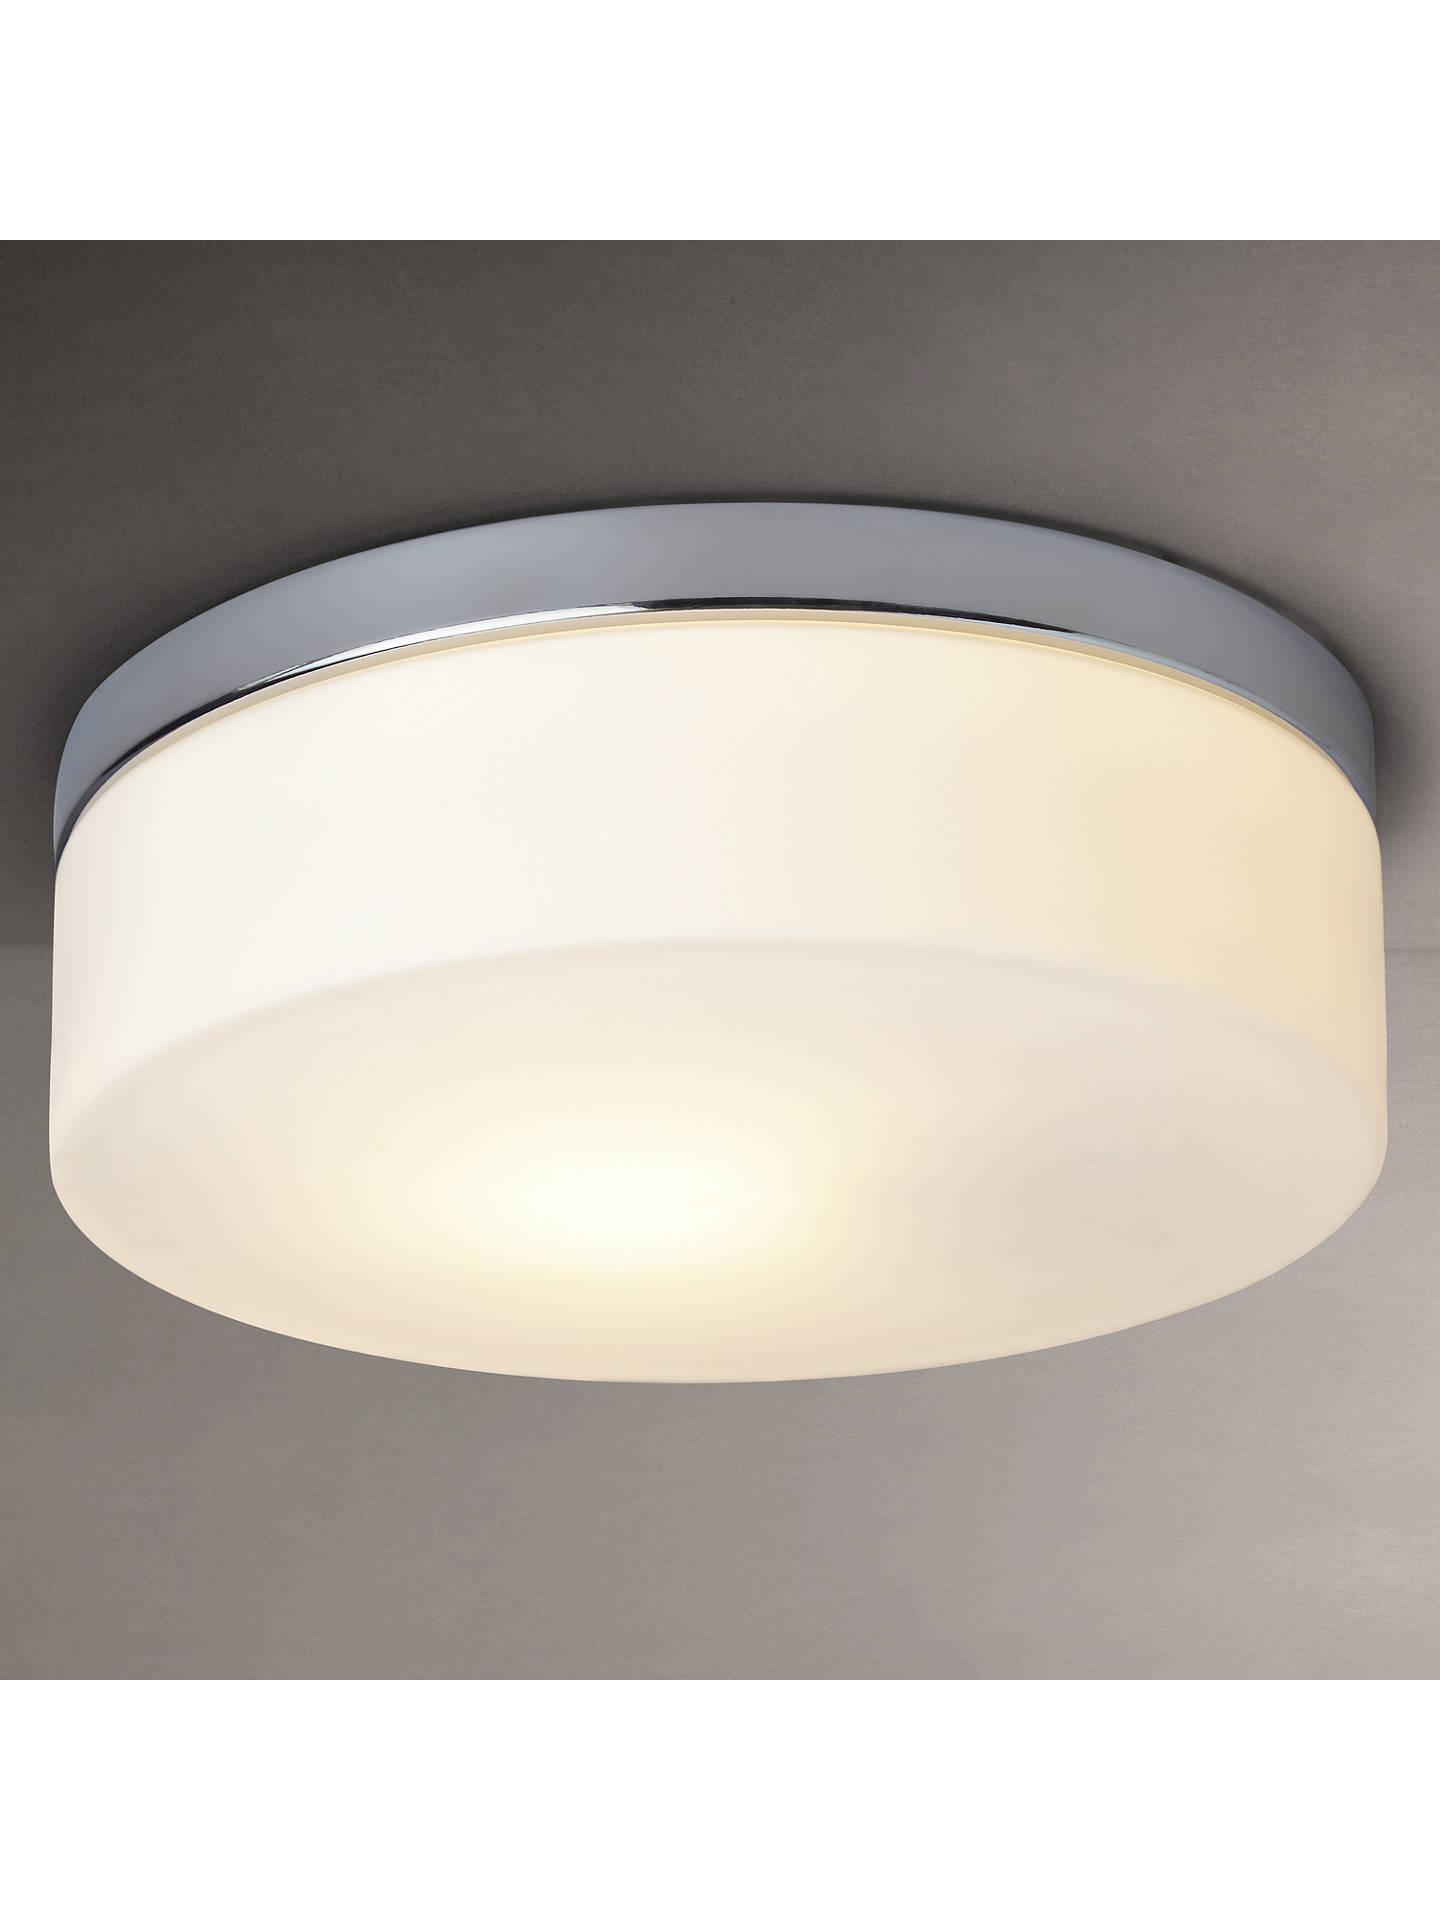 Astro Sabina Round Flush Bathroom Ceiling Light Online At Johnlewis